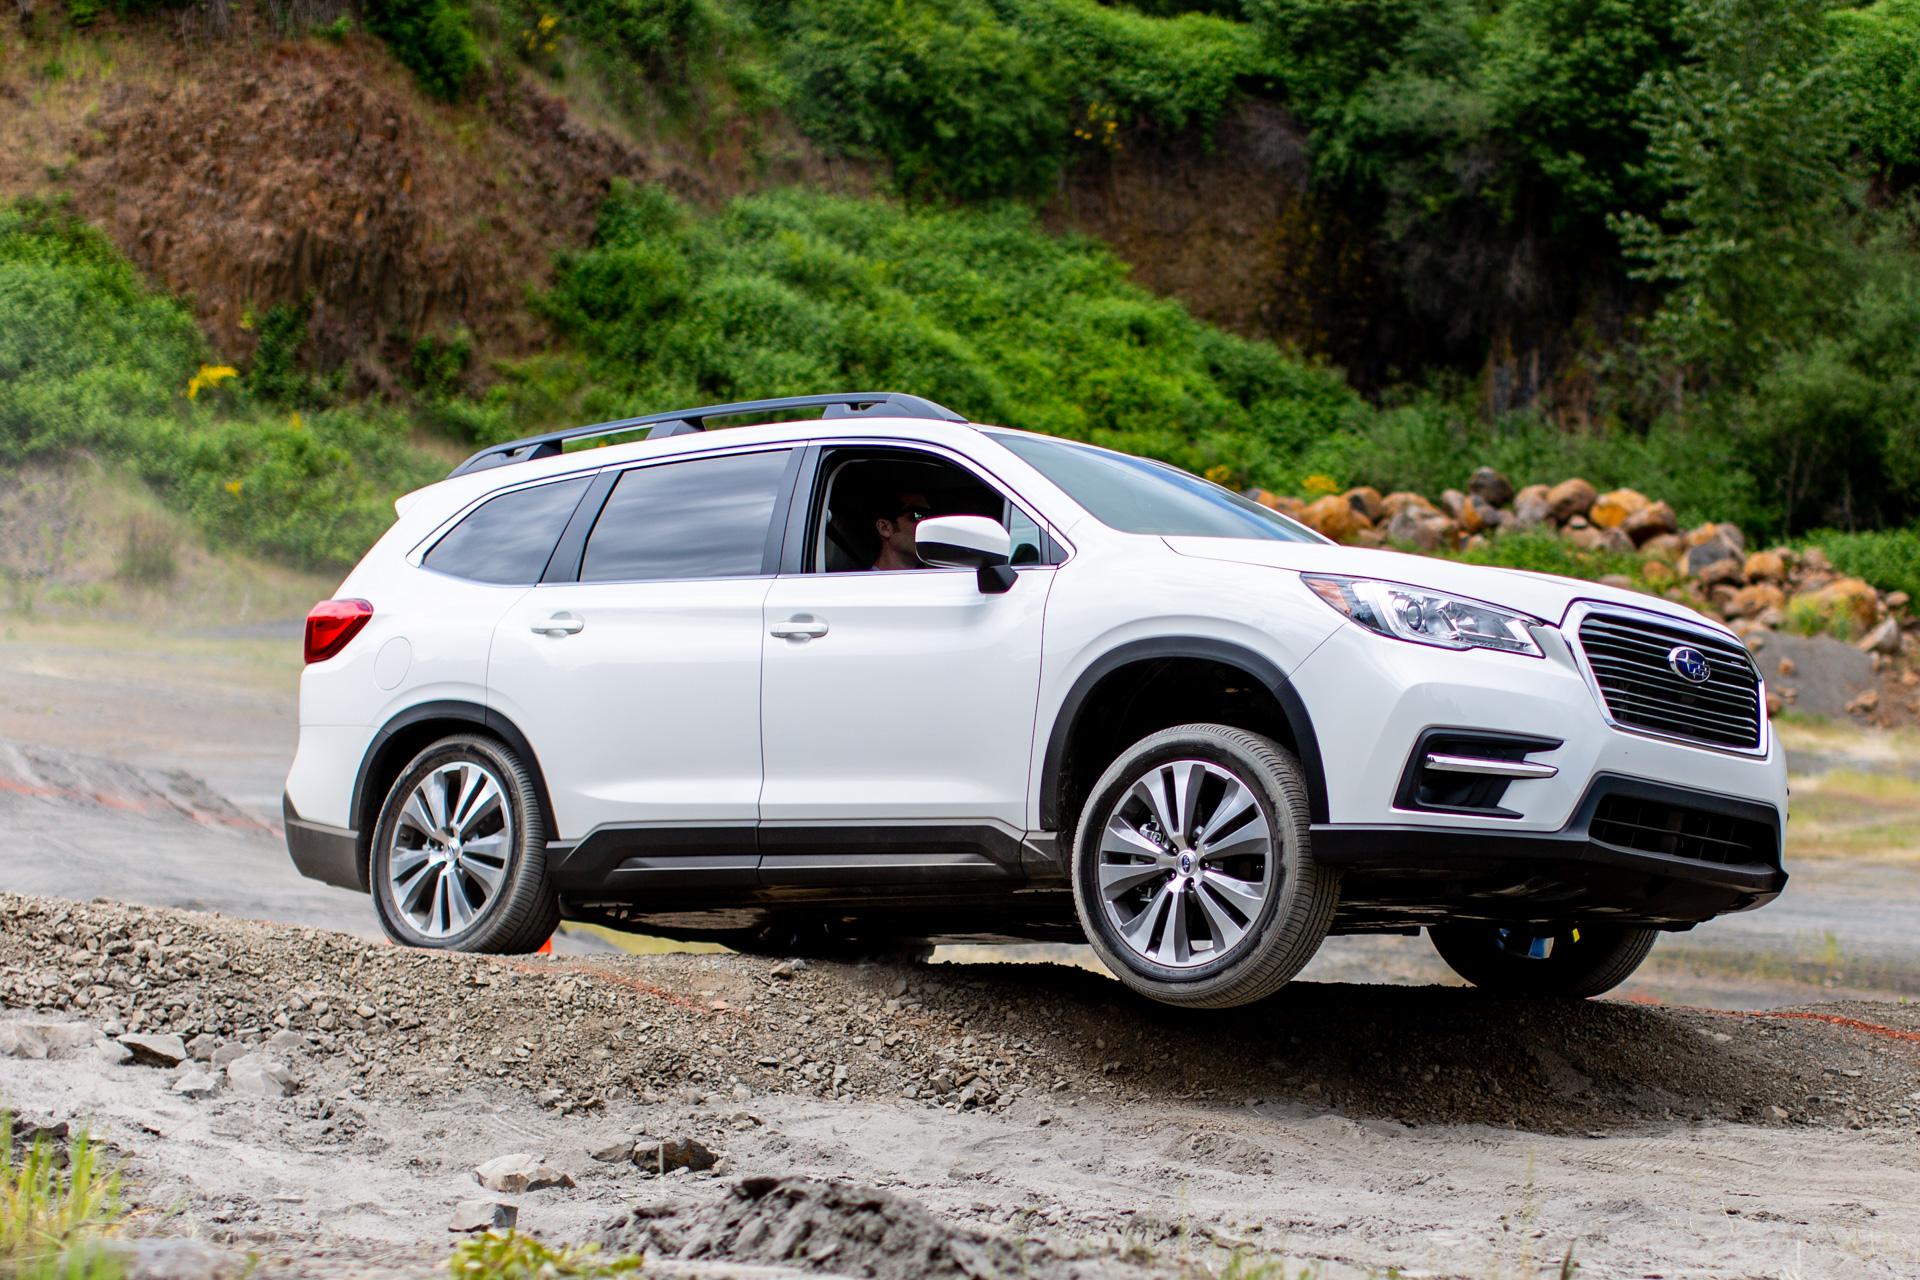 2019 Subaru Ascent Review Vw S Enthusiast Push Tesla